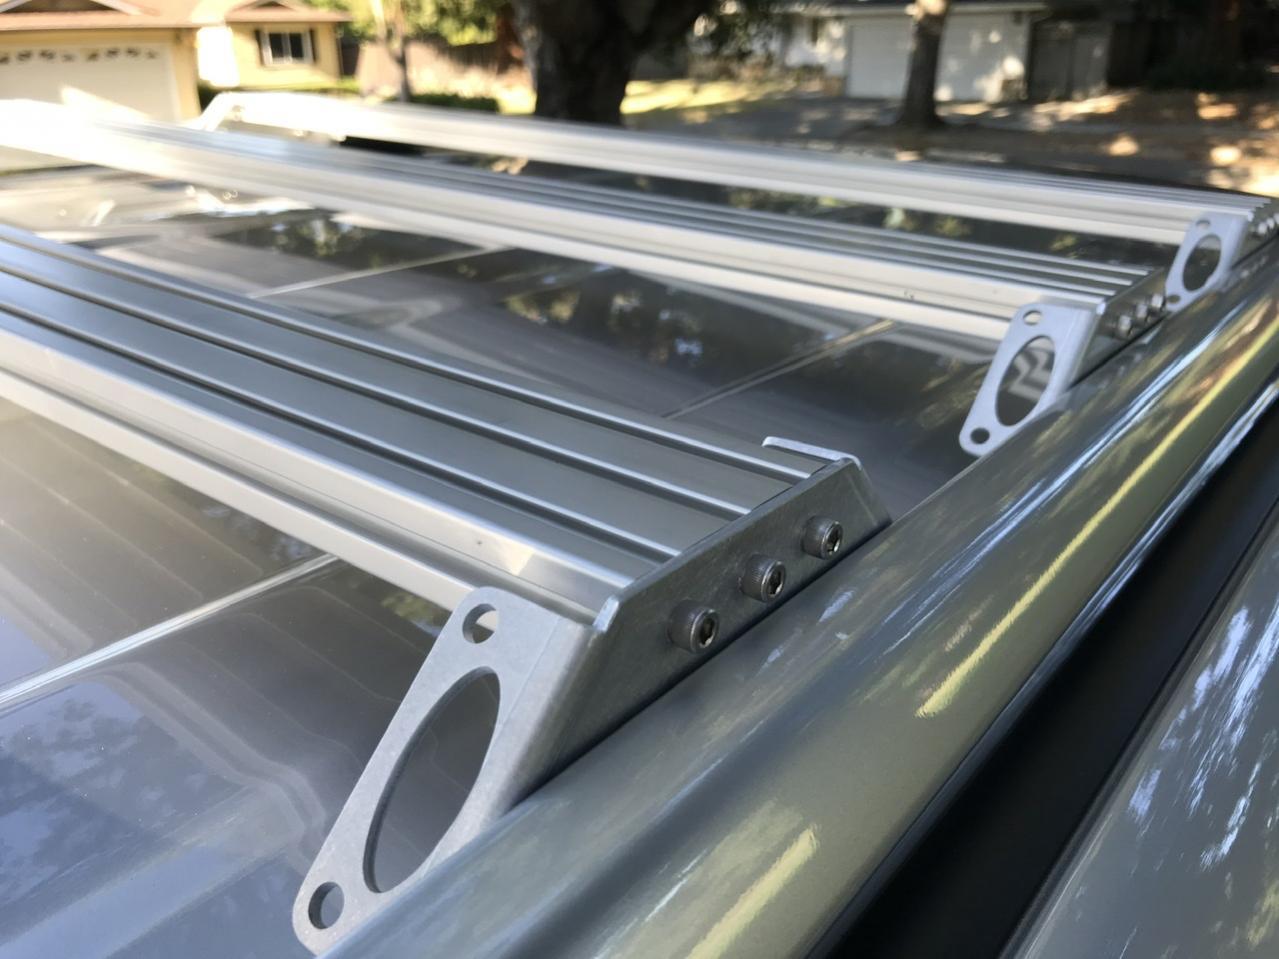 5th Gen Aluminum Roof Rack Using OEM Siderails: NiseRack-403eeb19-2278-4f02-9dab-55bc77e68842-jpg